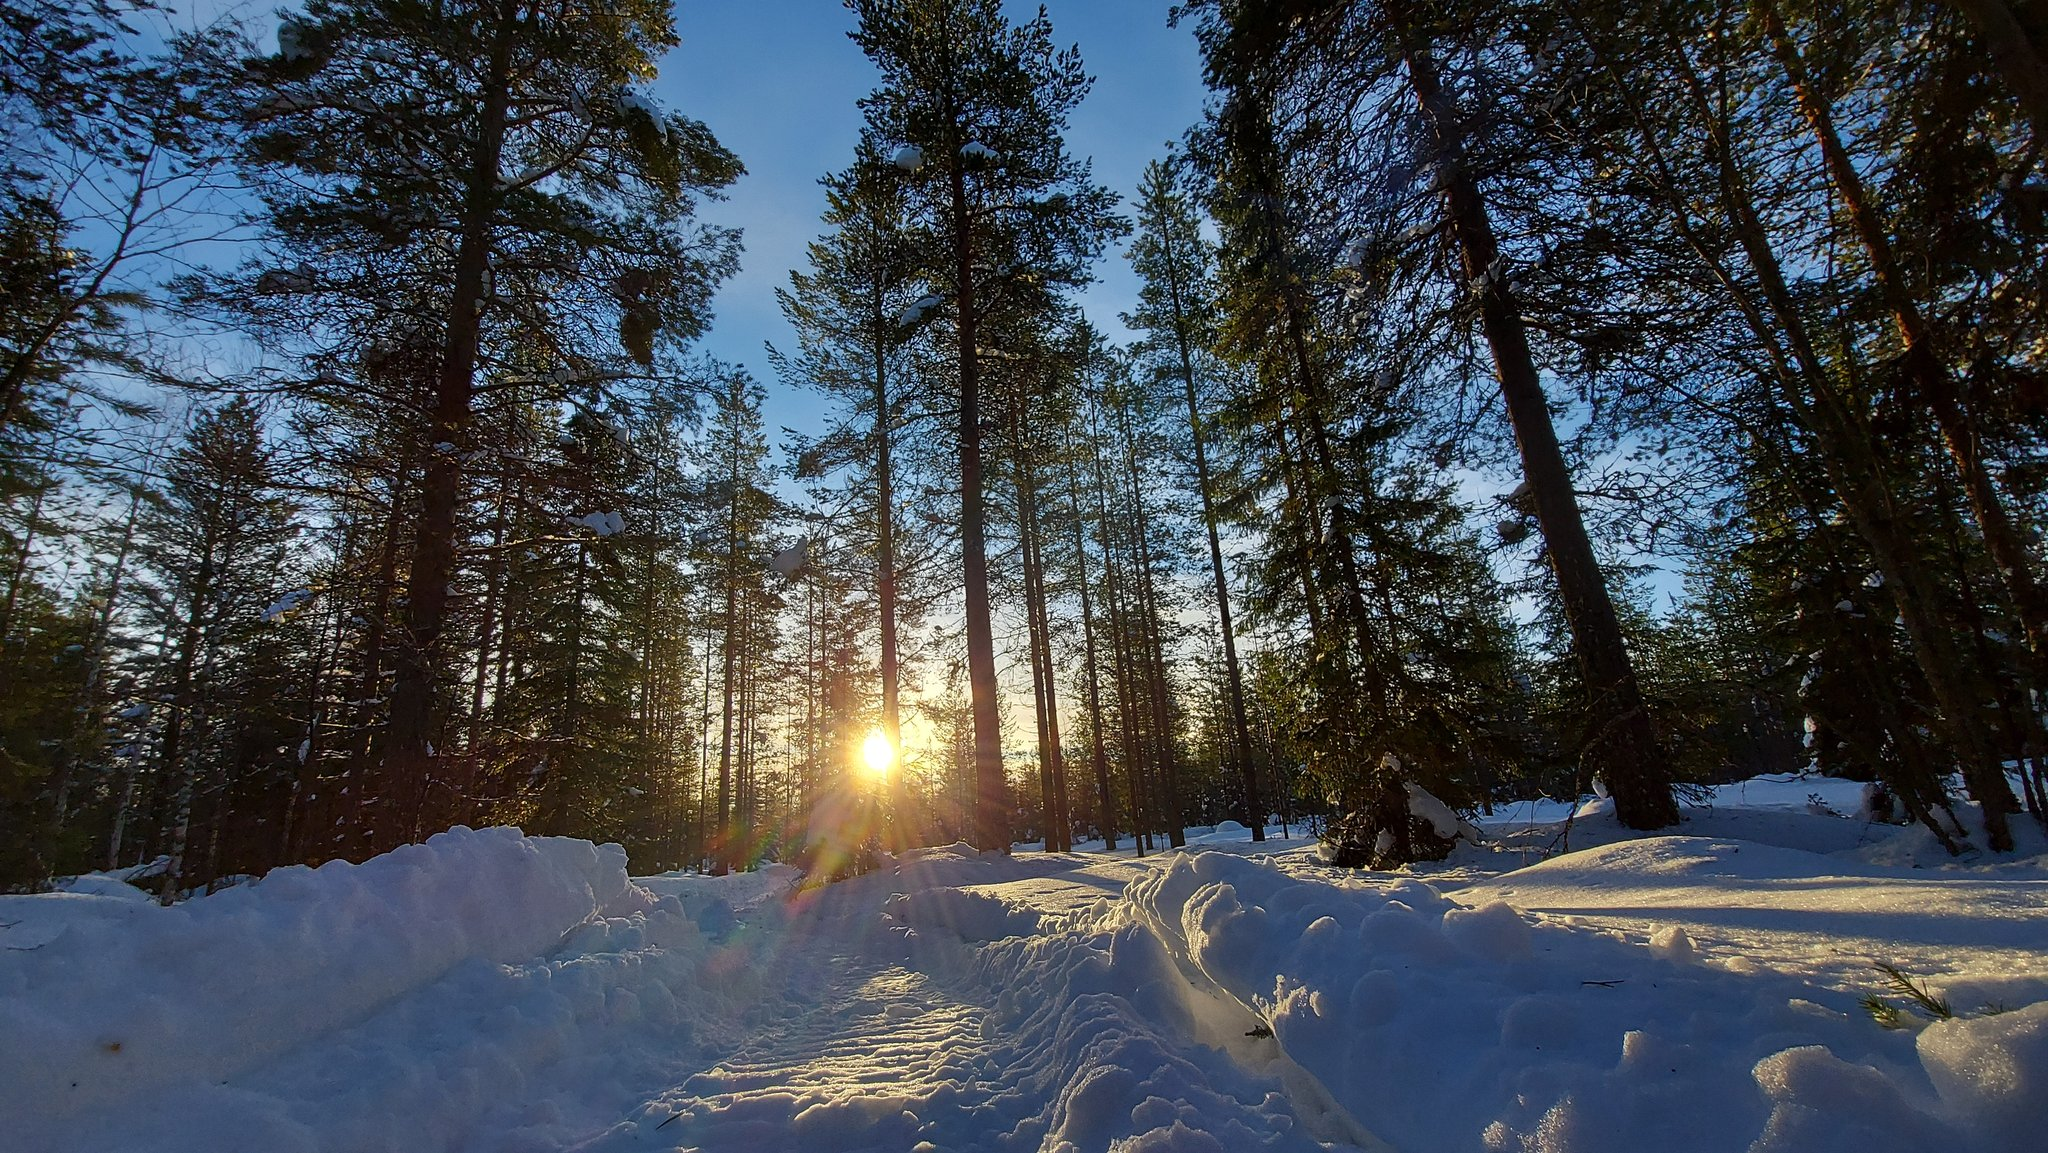 WRC: Arctic Rally Finland - Powered by CapitalBox [26-28 Febrero] - Página 4 EvNtfMbXUAInyH0?format=jpg&name=large